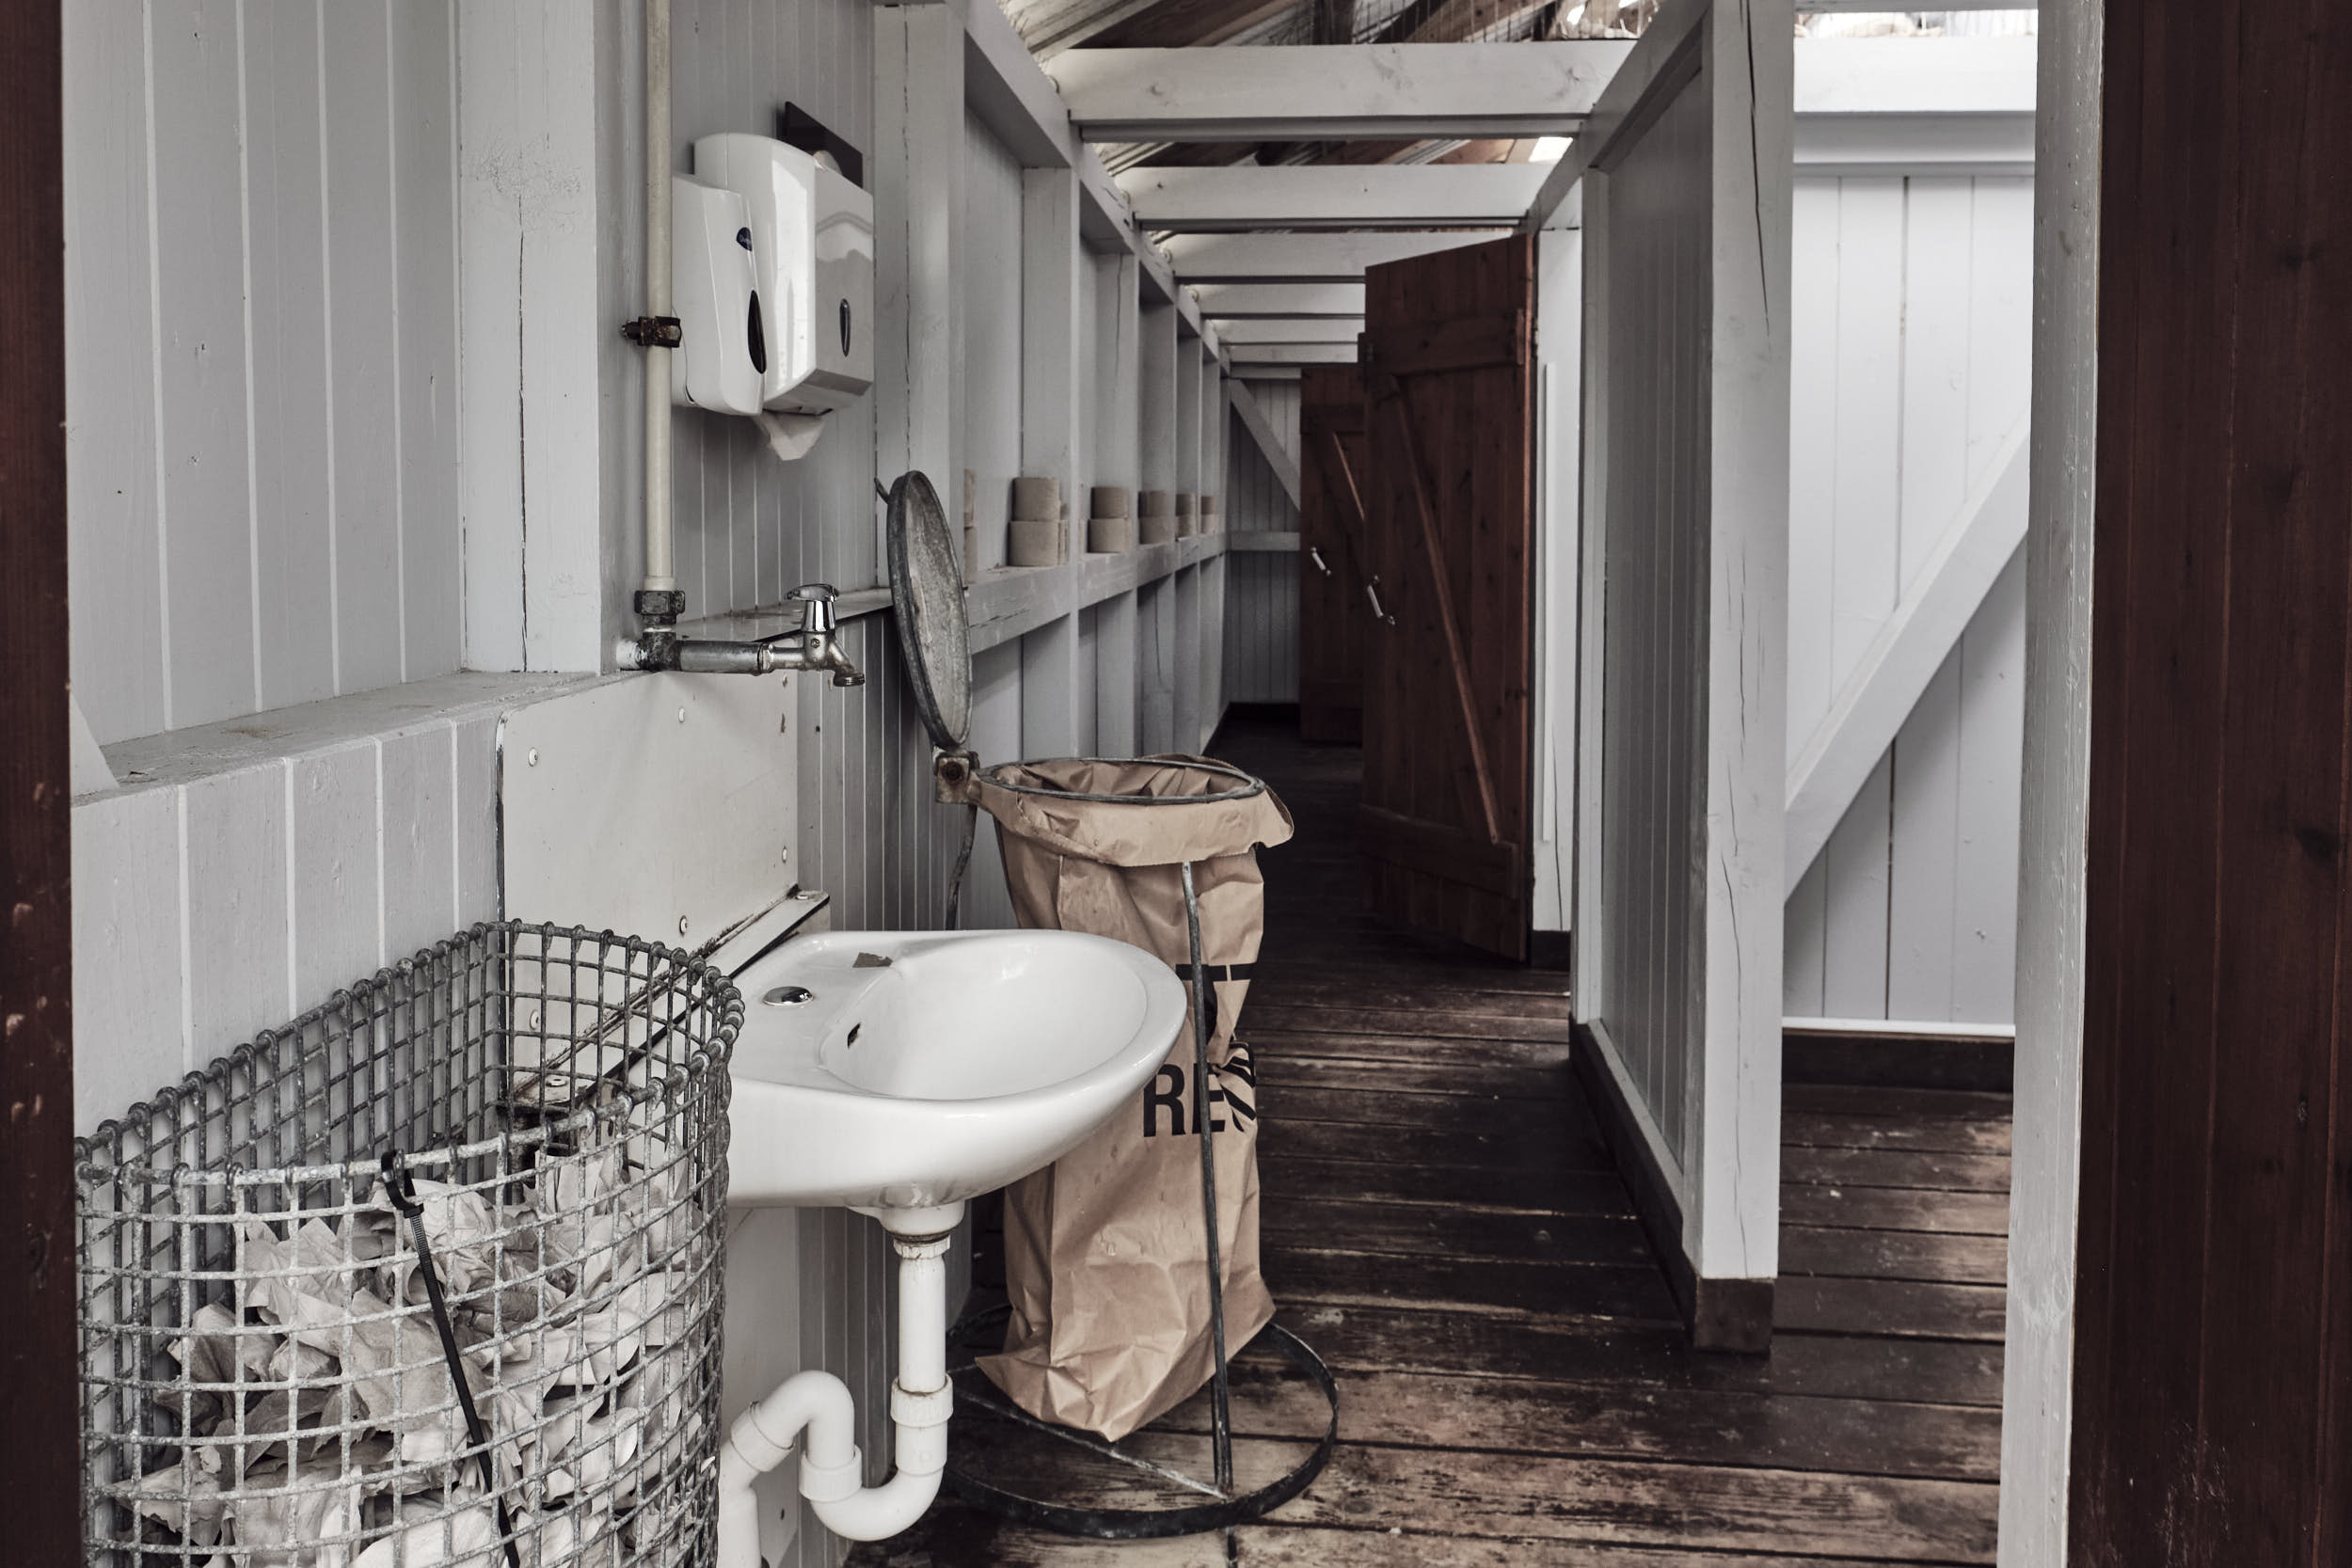 Handwaschbecken historisches Toilettenhaus Strand Sankt-Peter-Ording